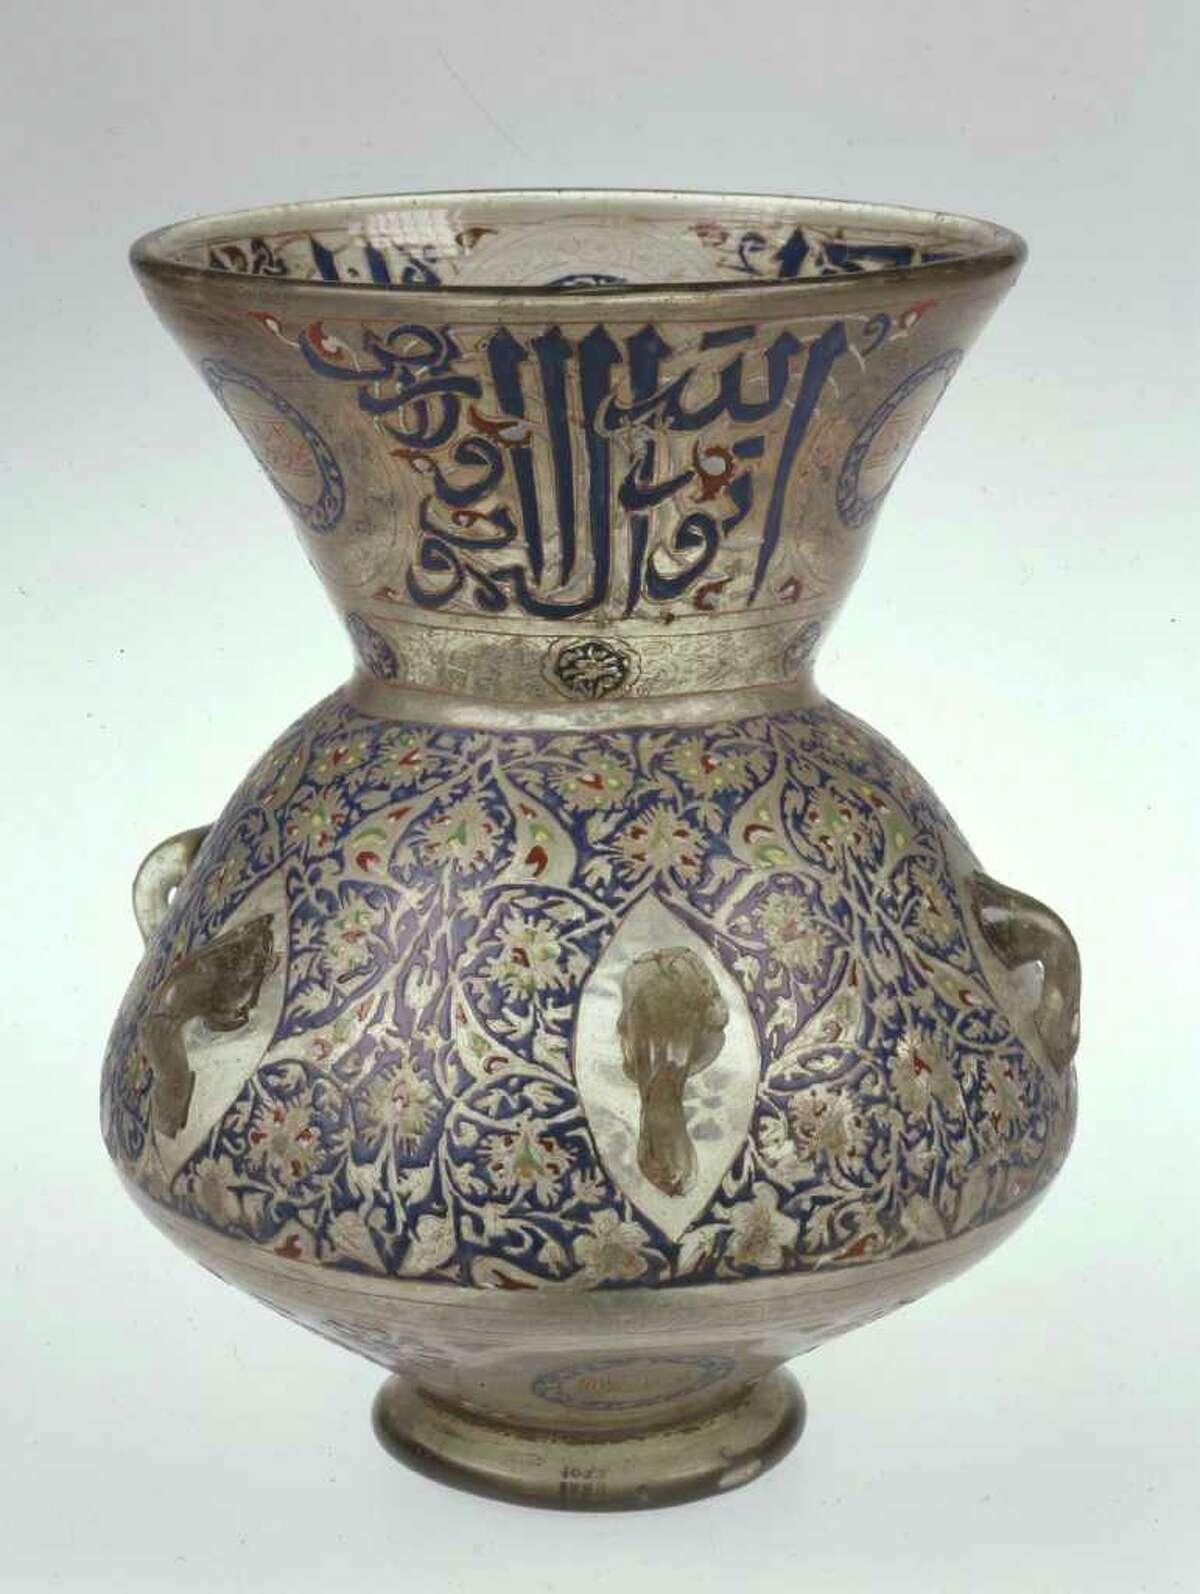 Mosque Lamp Egypt or Syria, c. 1354-61 Enameled and gilded glass Museu Calouste Gulbenkian, Lisbon (1022) Photo Museu Calouste Gulbenkina / Art Resrouce, NY, photo: Catarina Gomes Ferreira